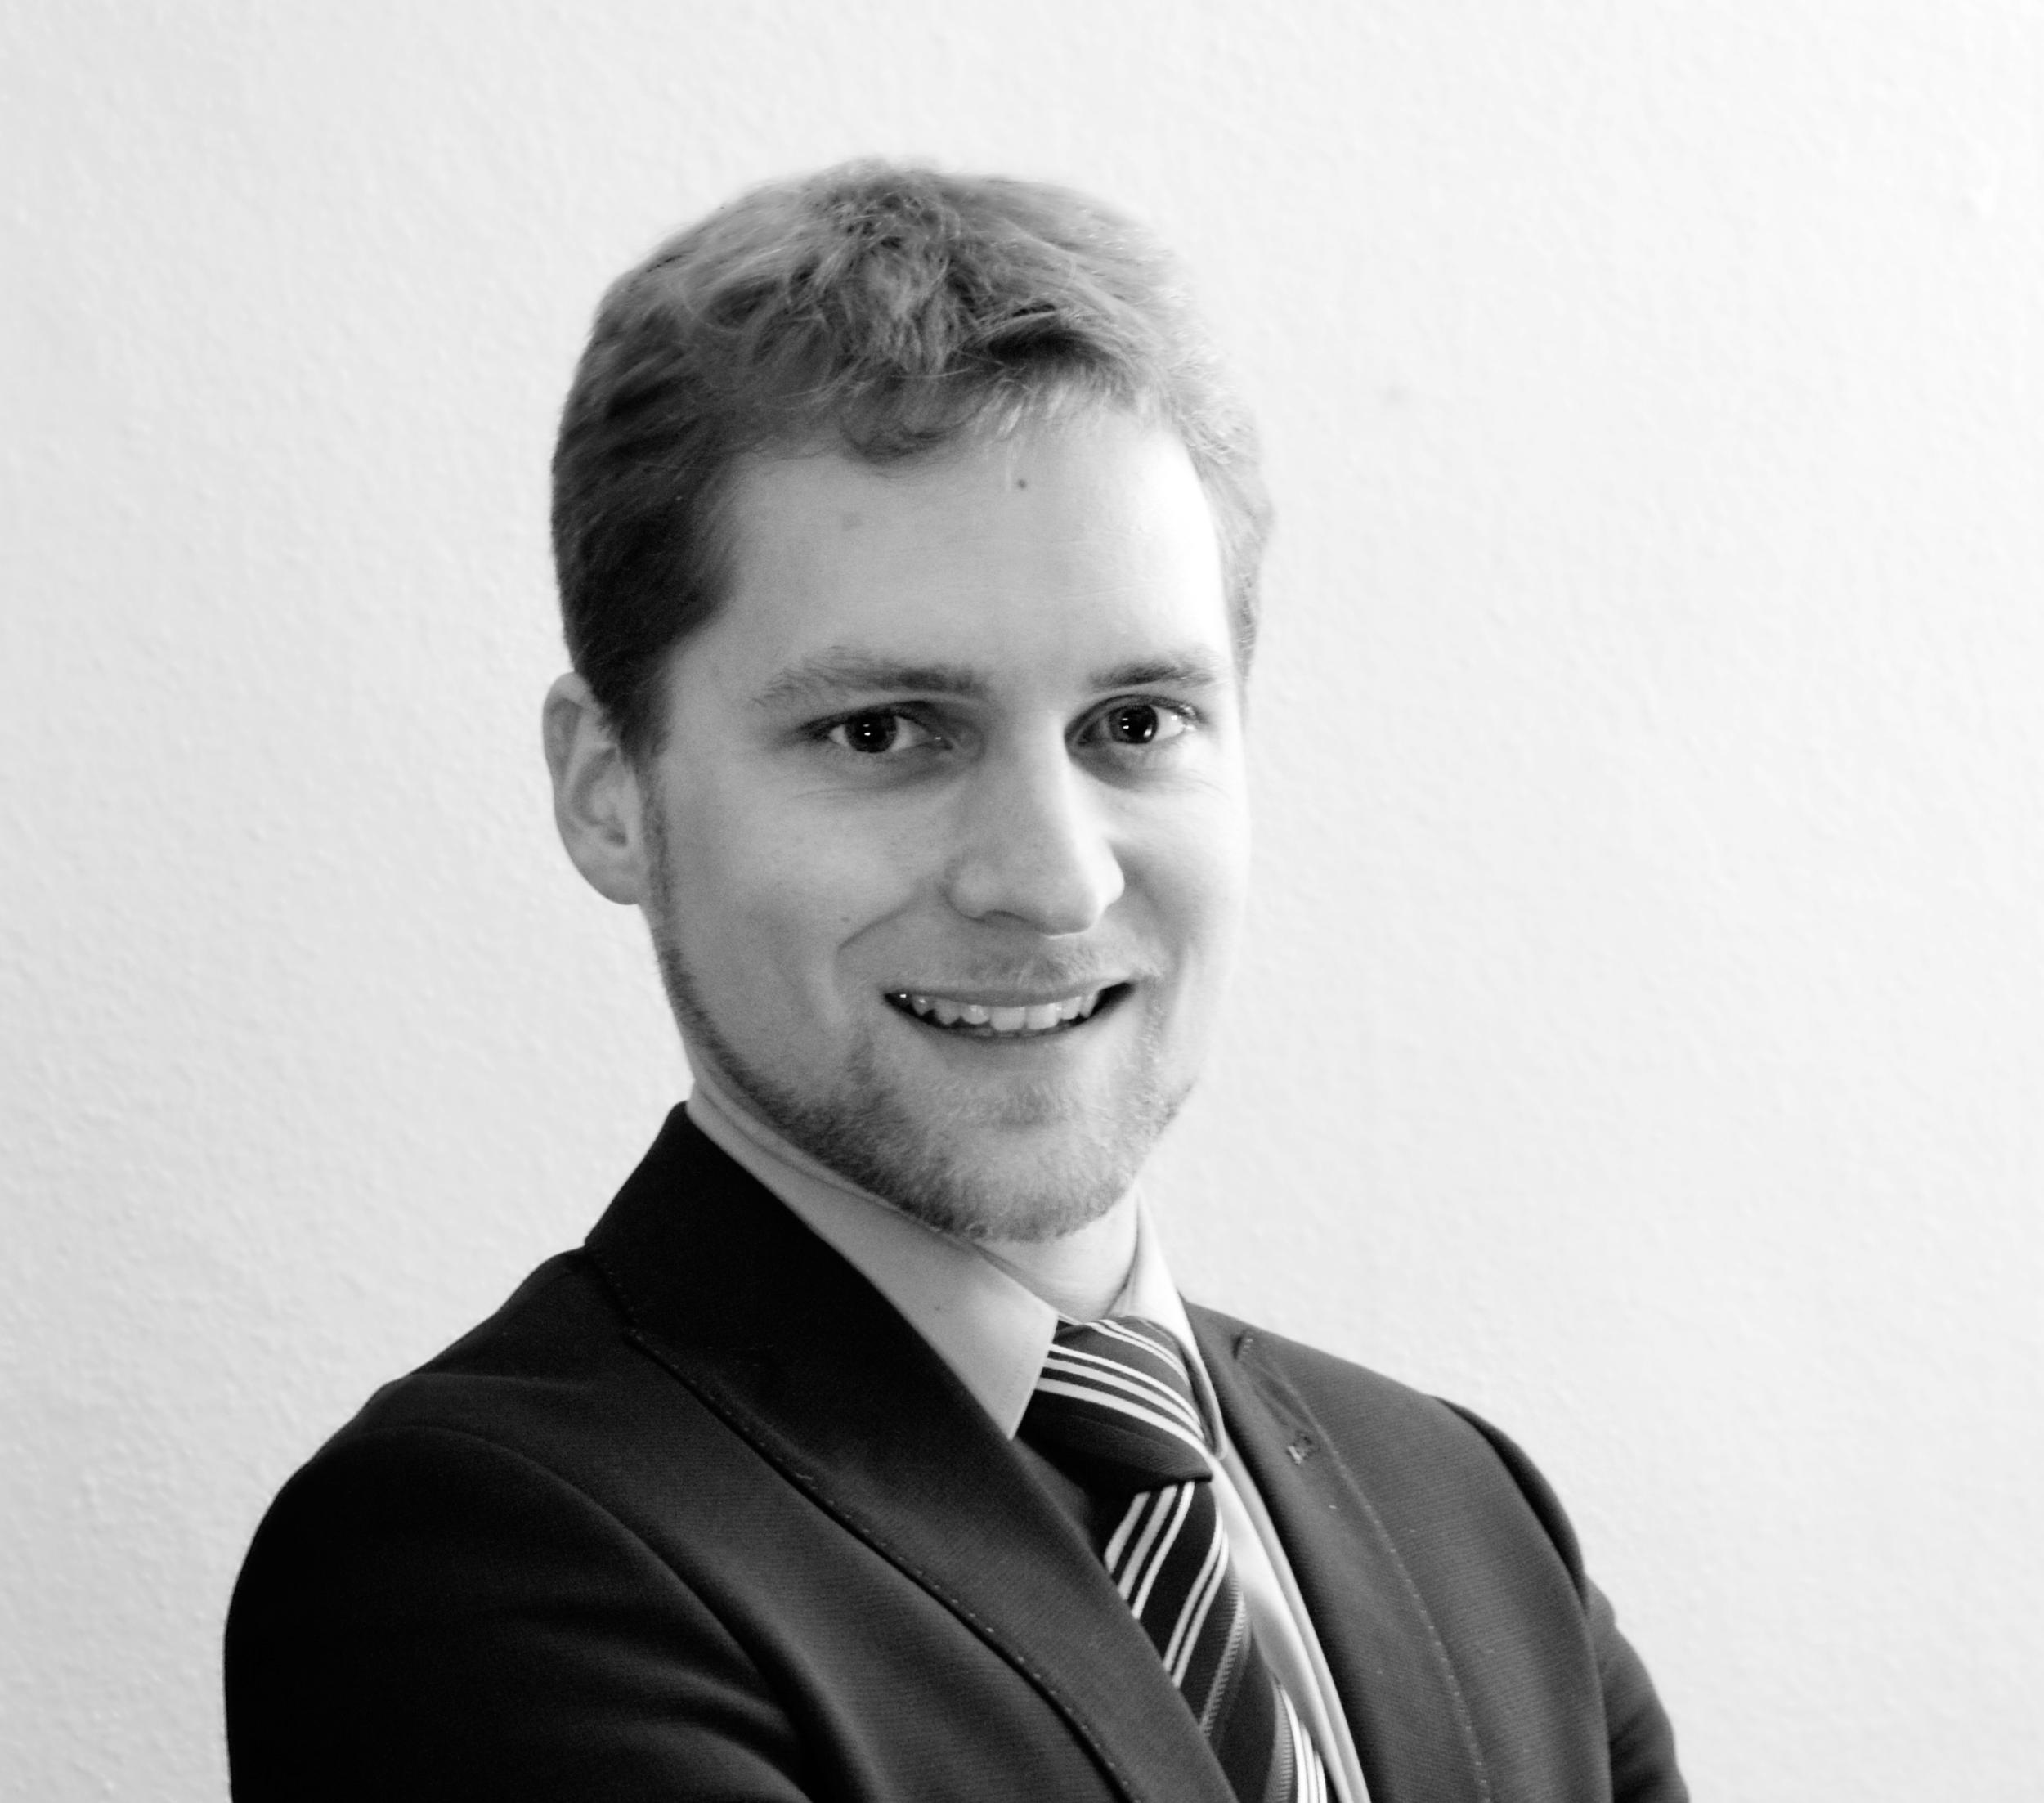 Michael Pachlatko -   Head of Operations